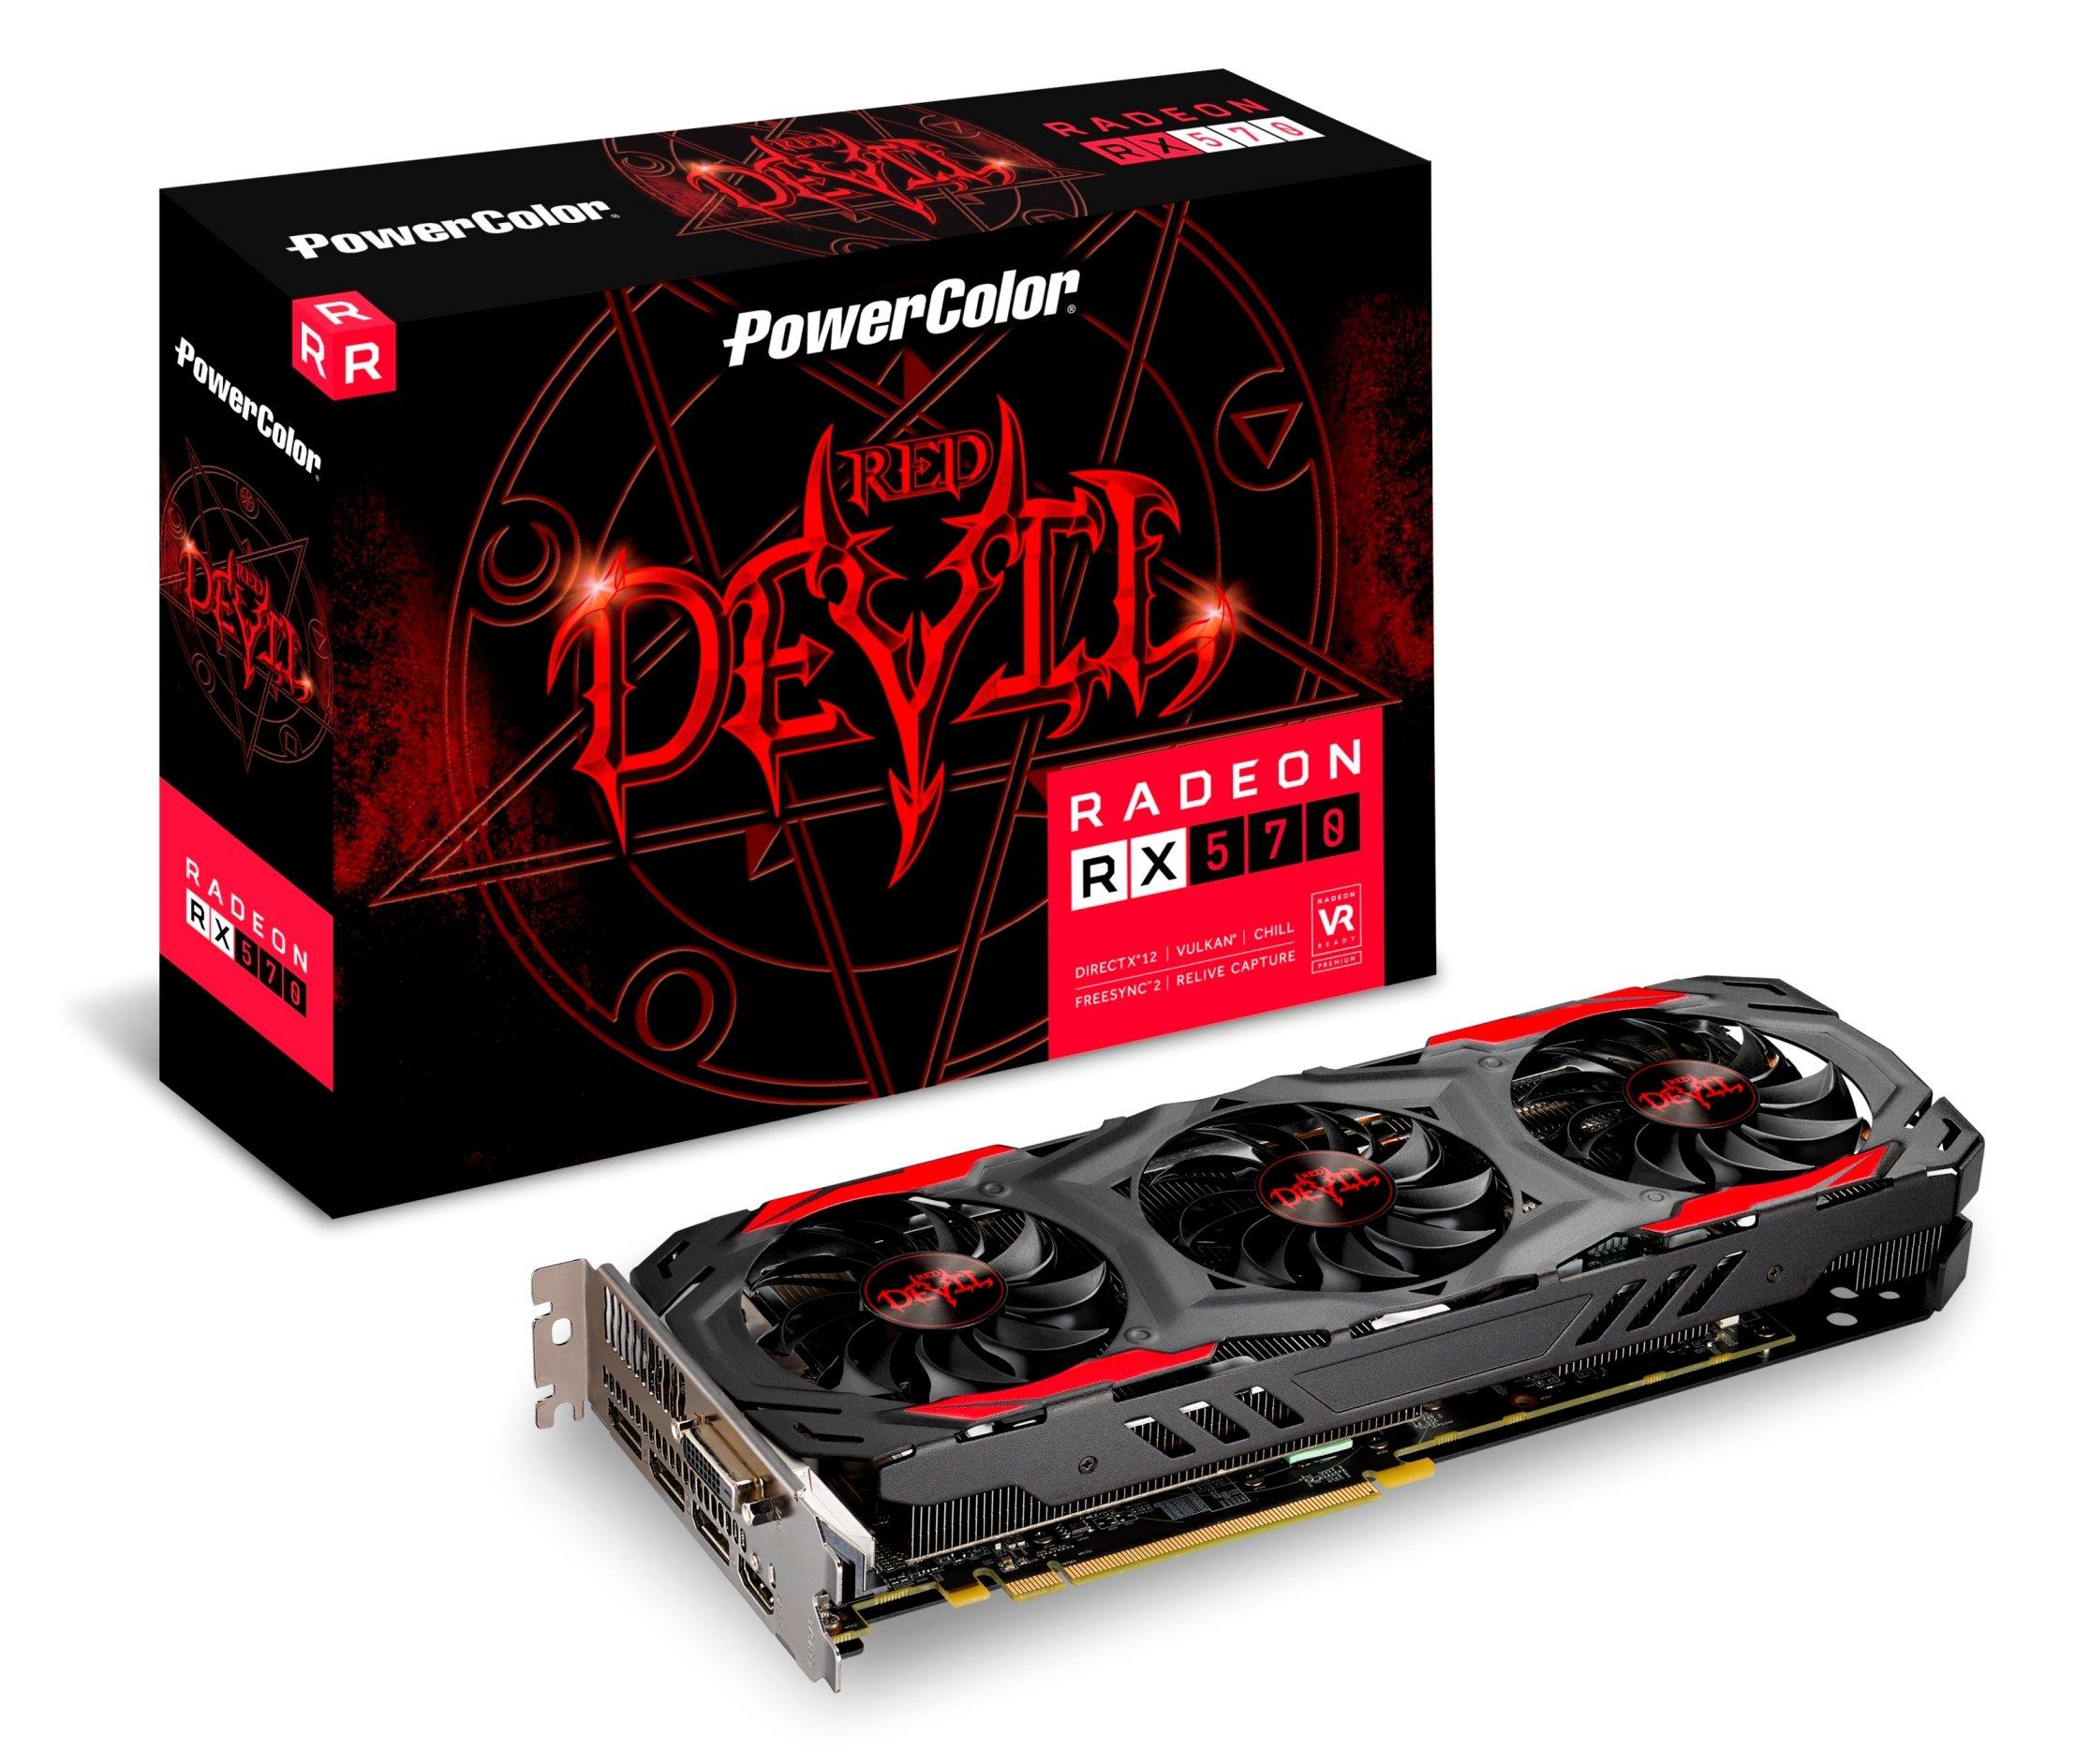 PowerColor AXRX 570 4GBD5-3DH/OC Video Card